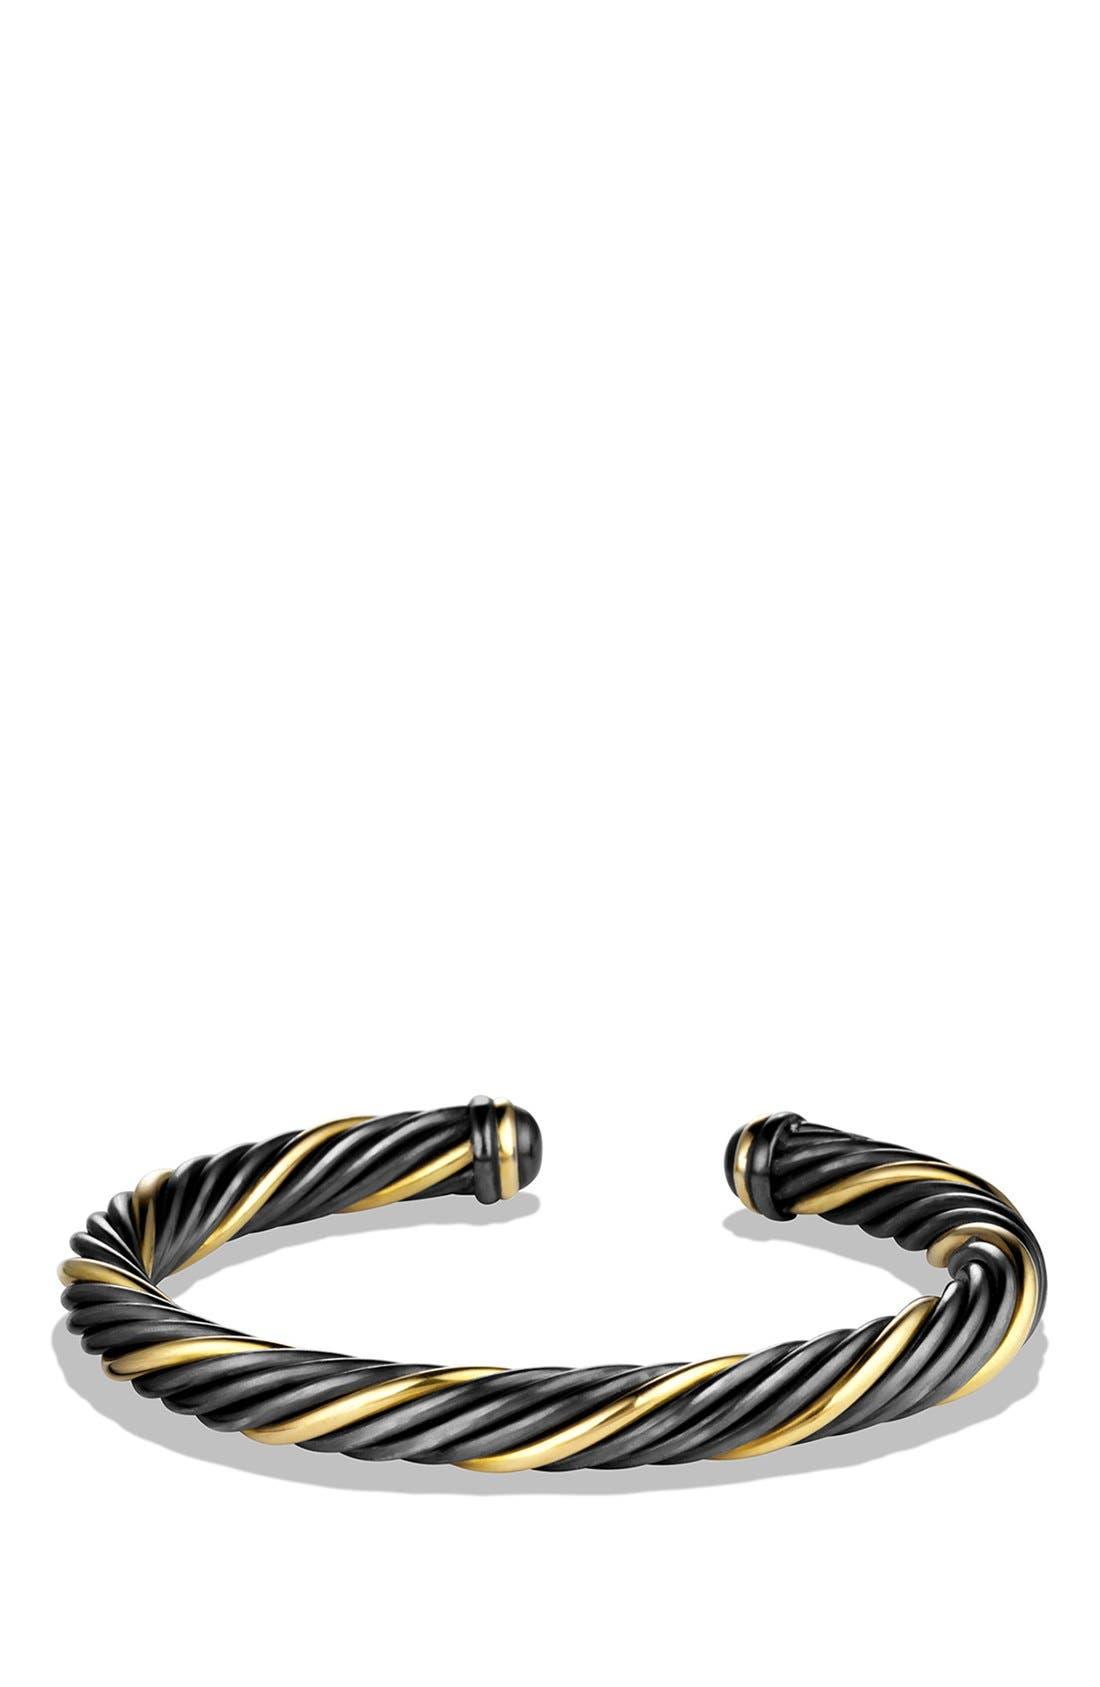 Alternate Image 1 Selected - David Yurman 'Black and Gold' Cable Bracelet